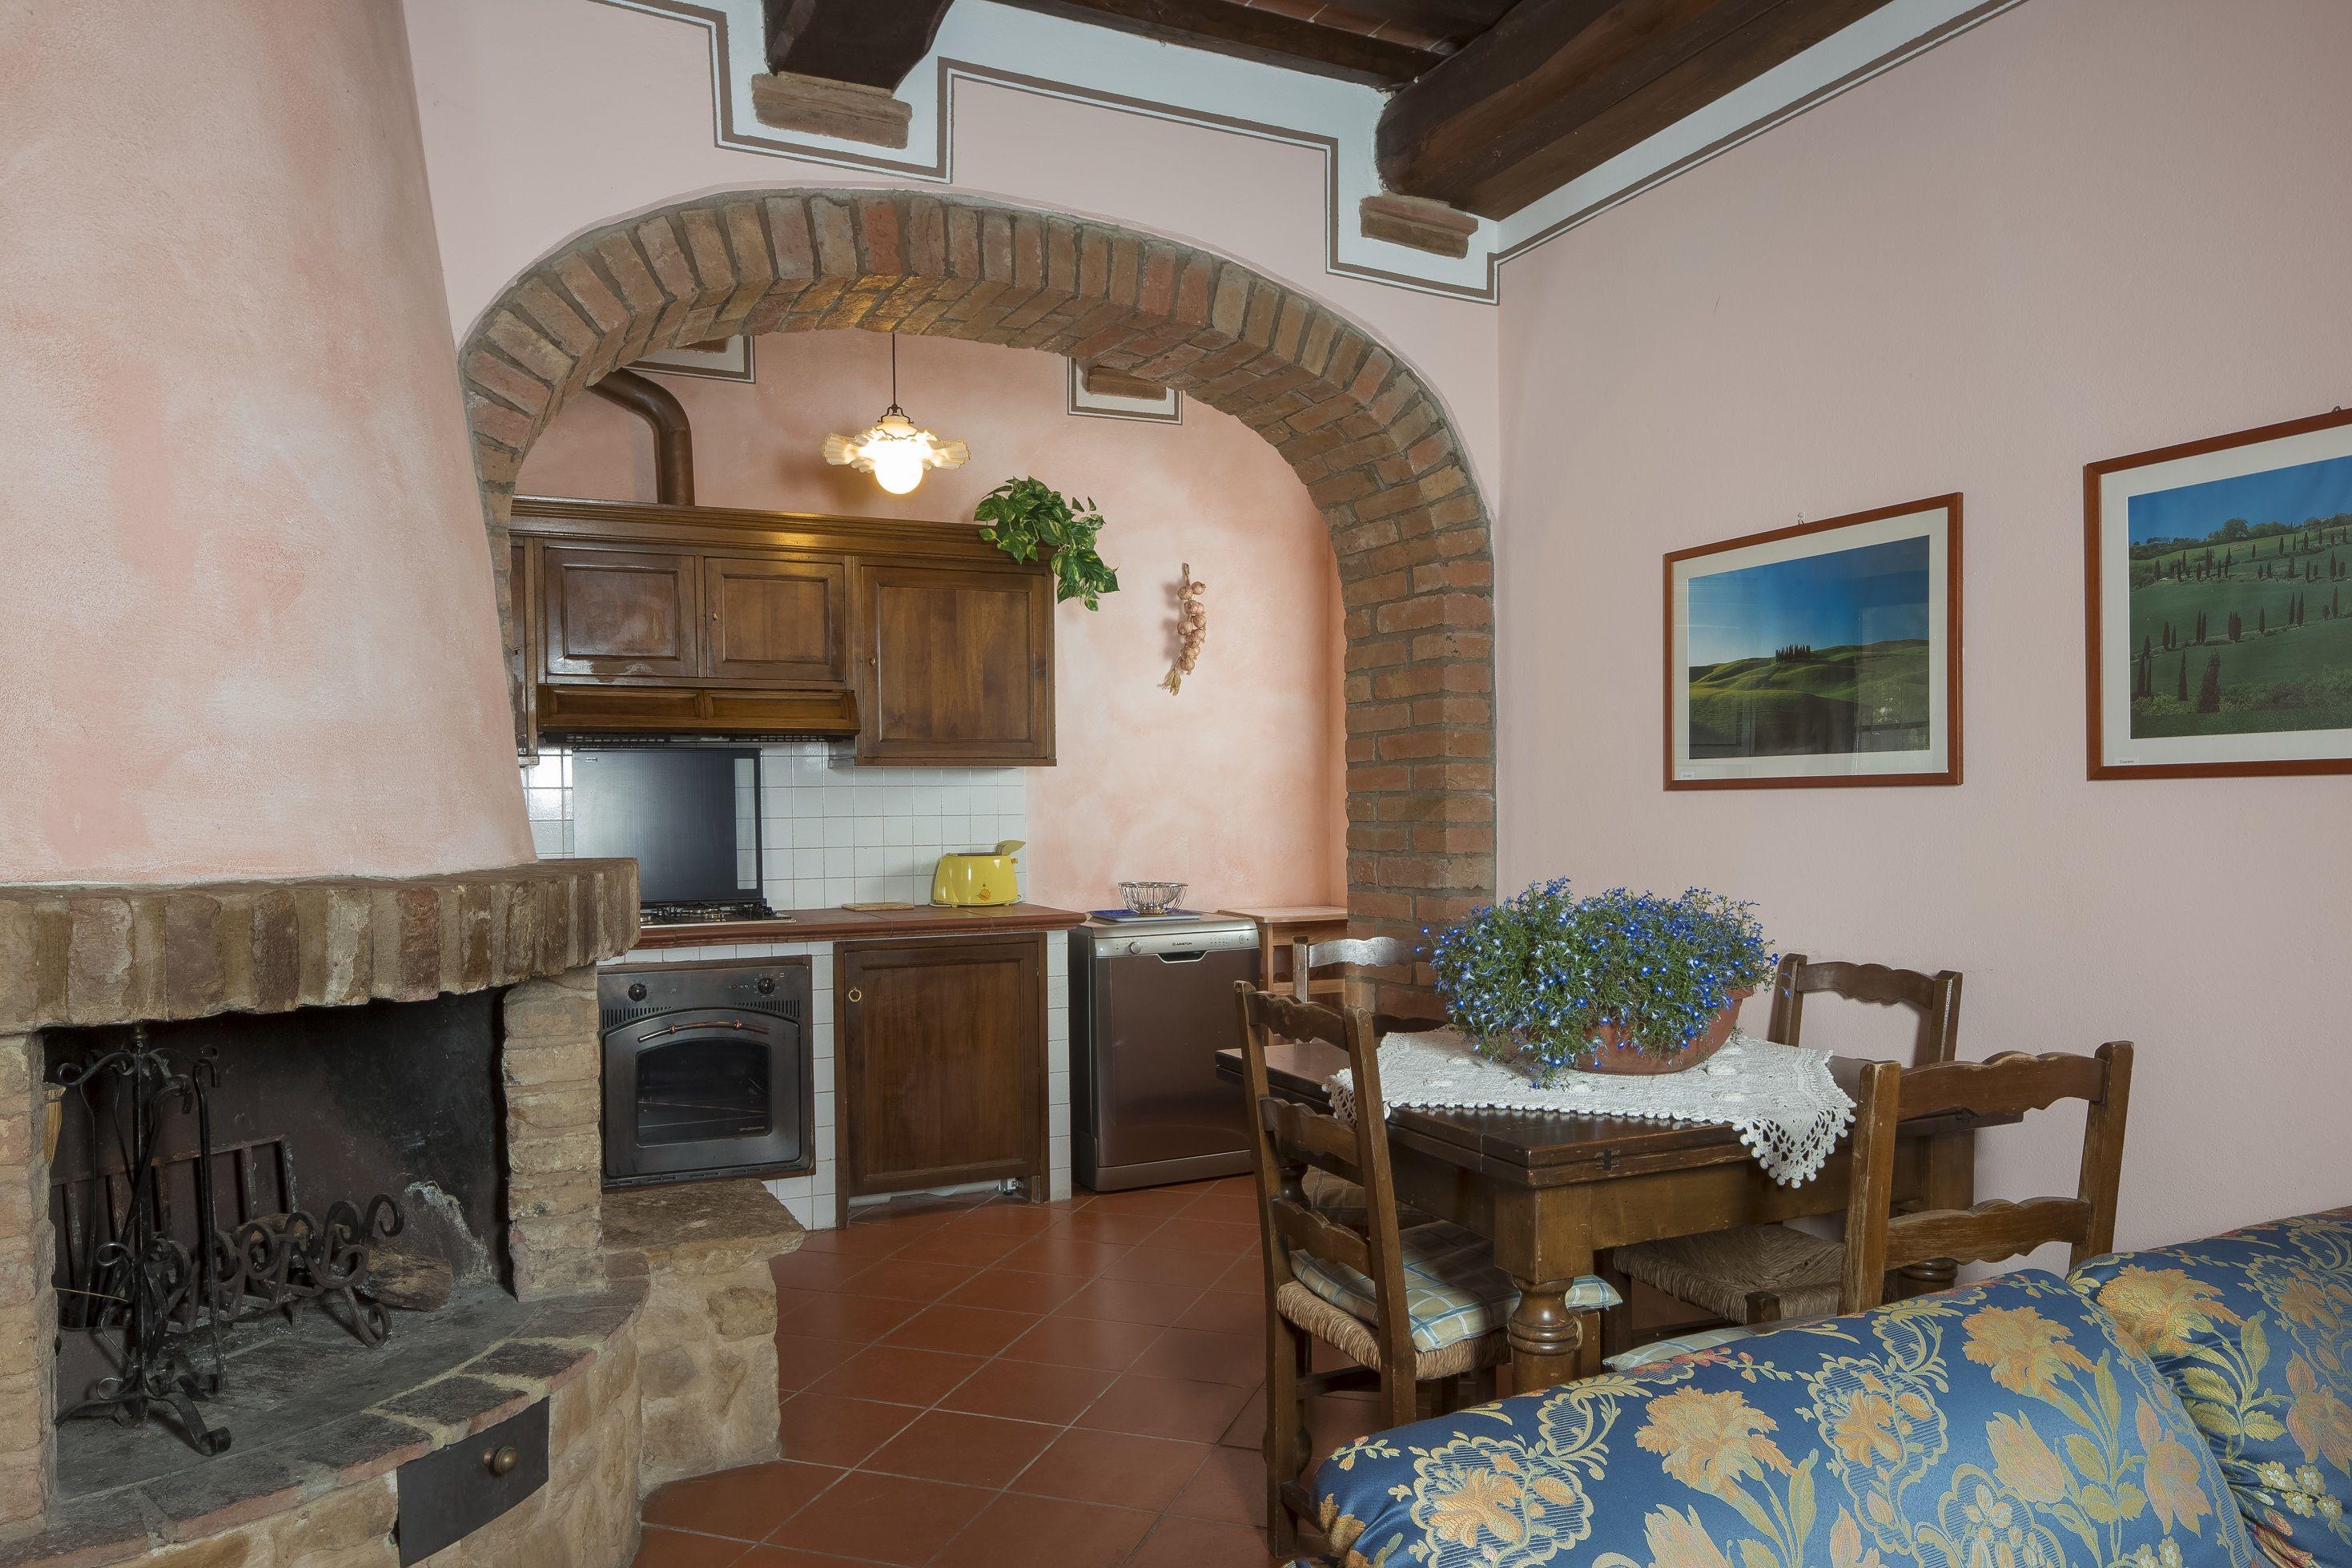 Apartment Agriturismo Il Sapito - Cherubini Holiday Home photo 16678067